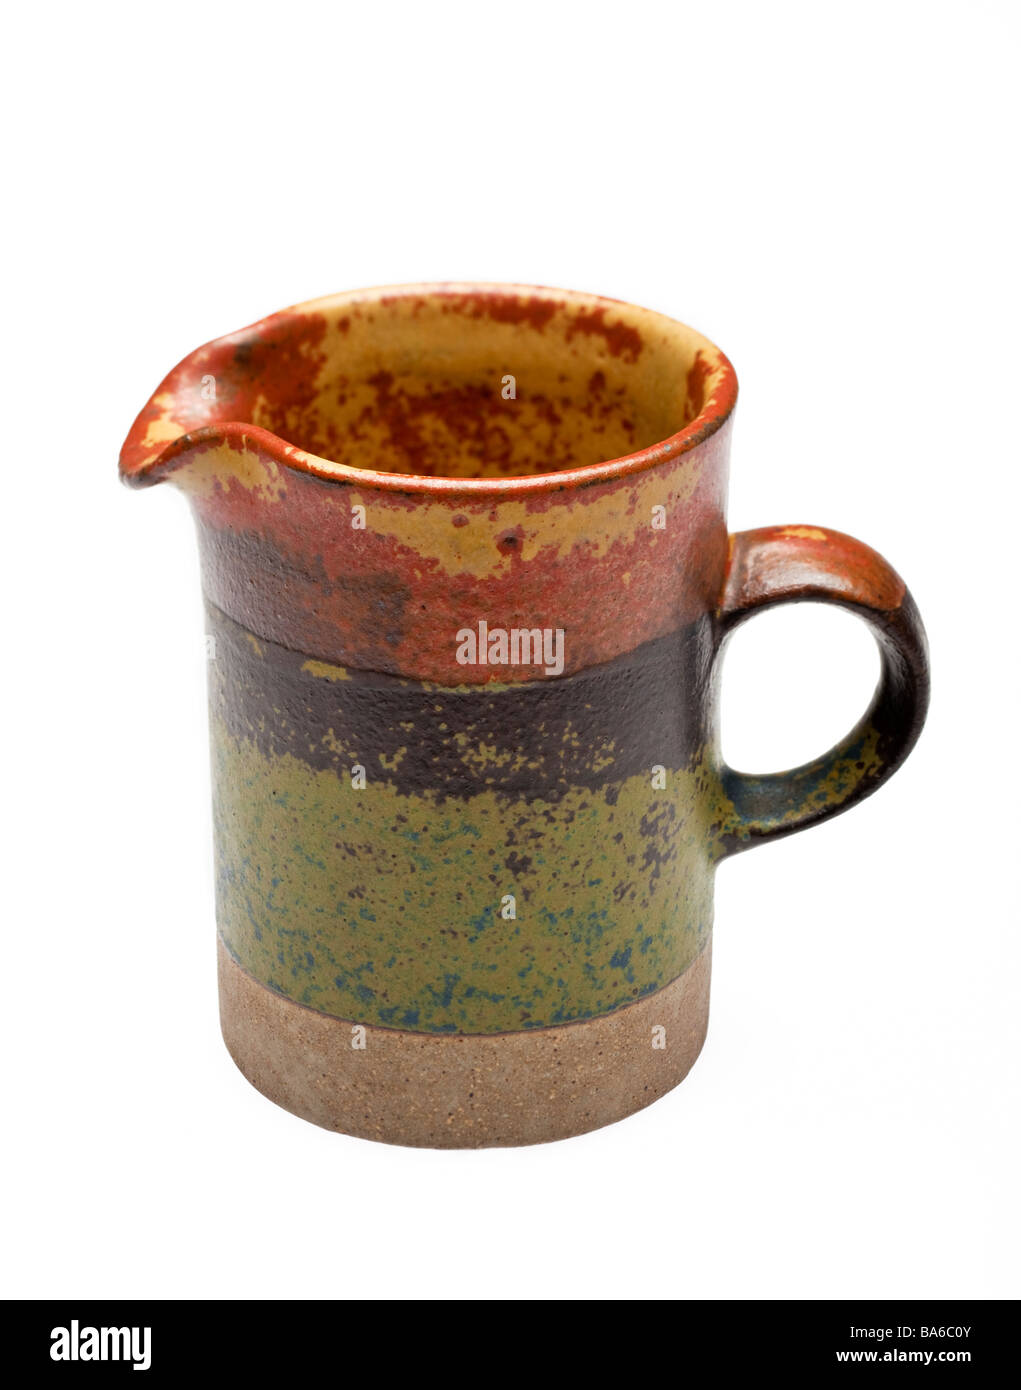 Pottery creamer jug - Stock Image